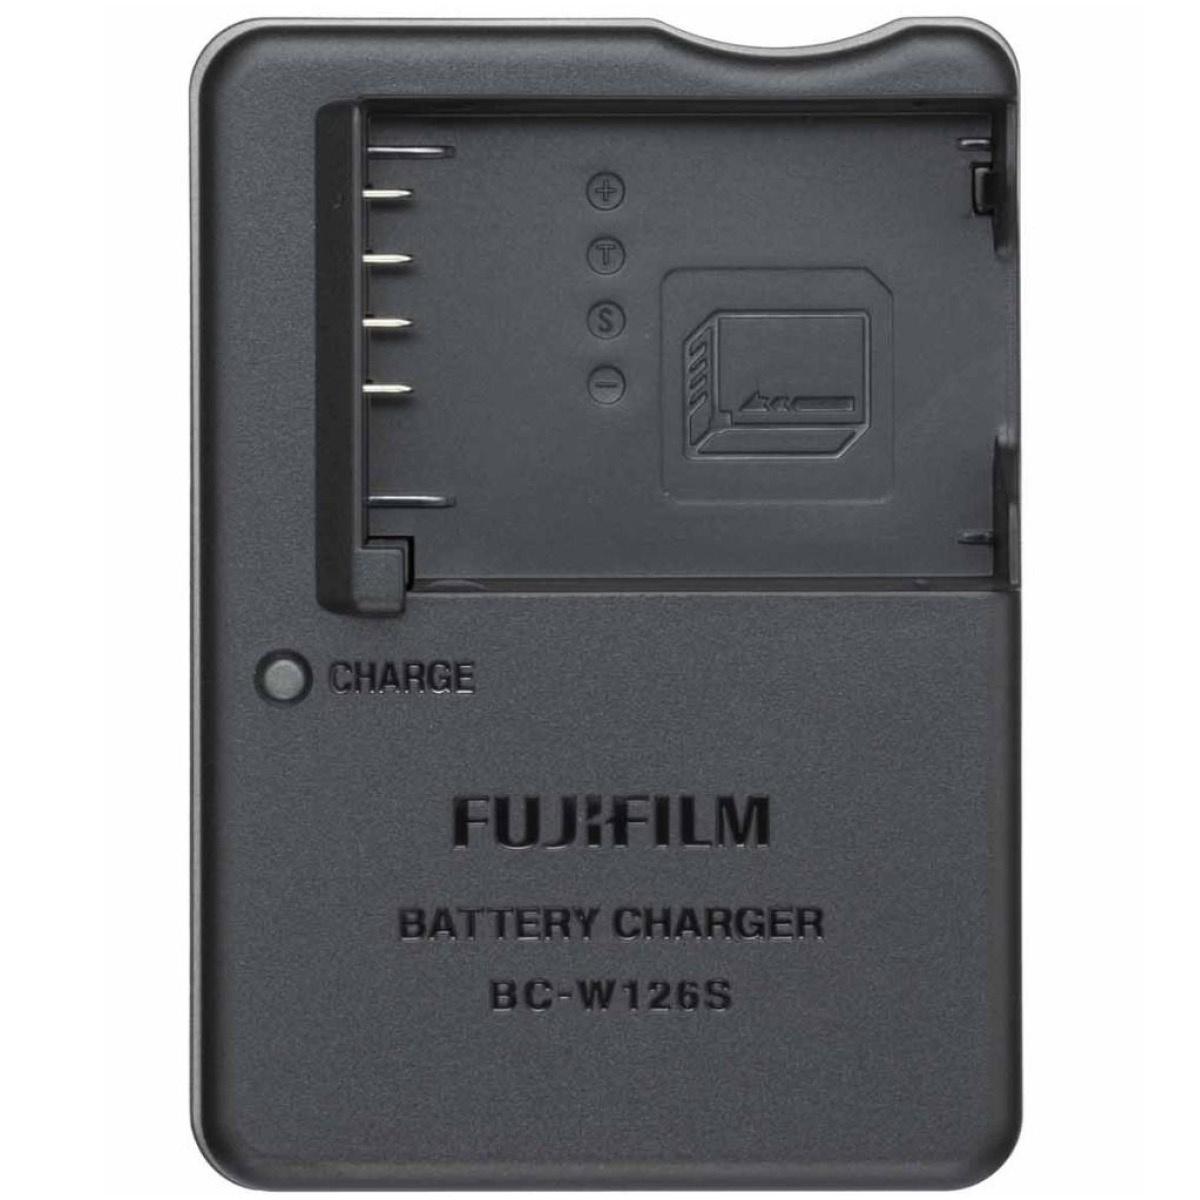 Fujifilm BC-W 126S Ladegerät